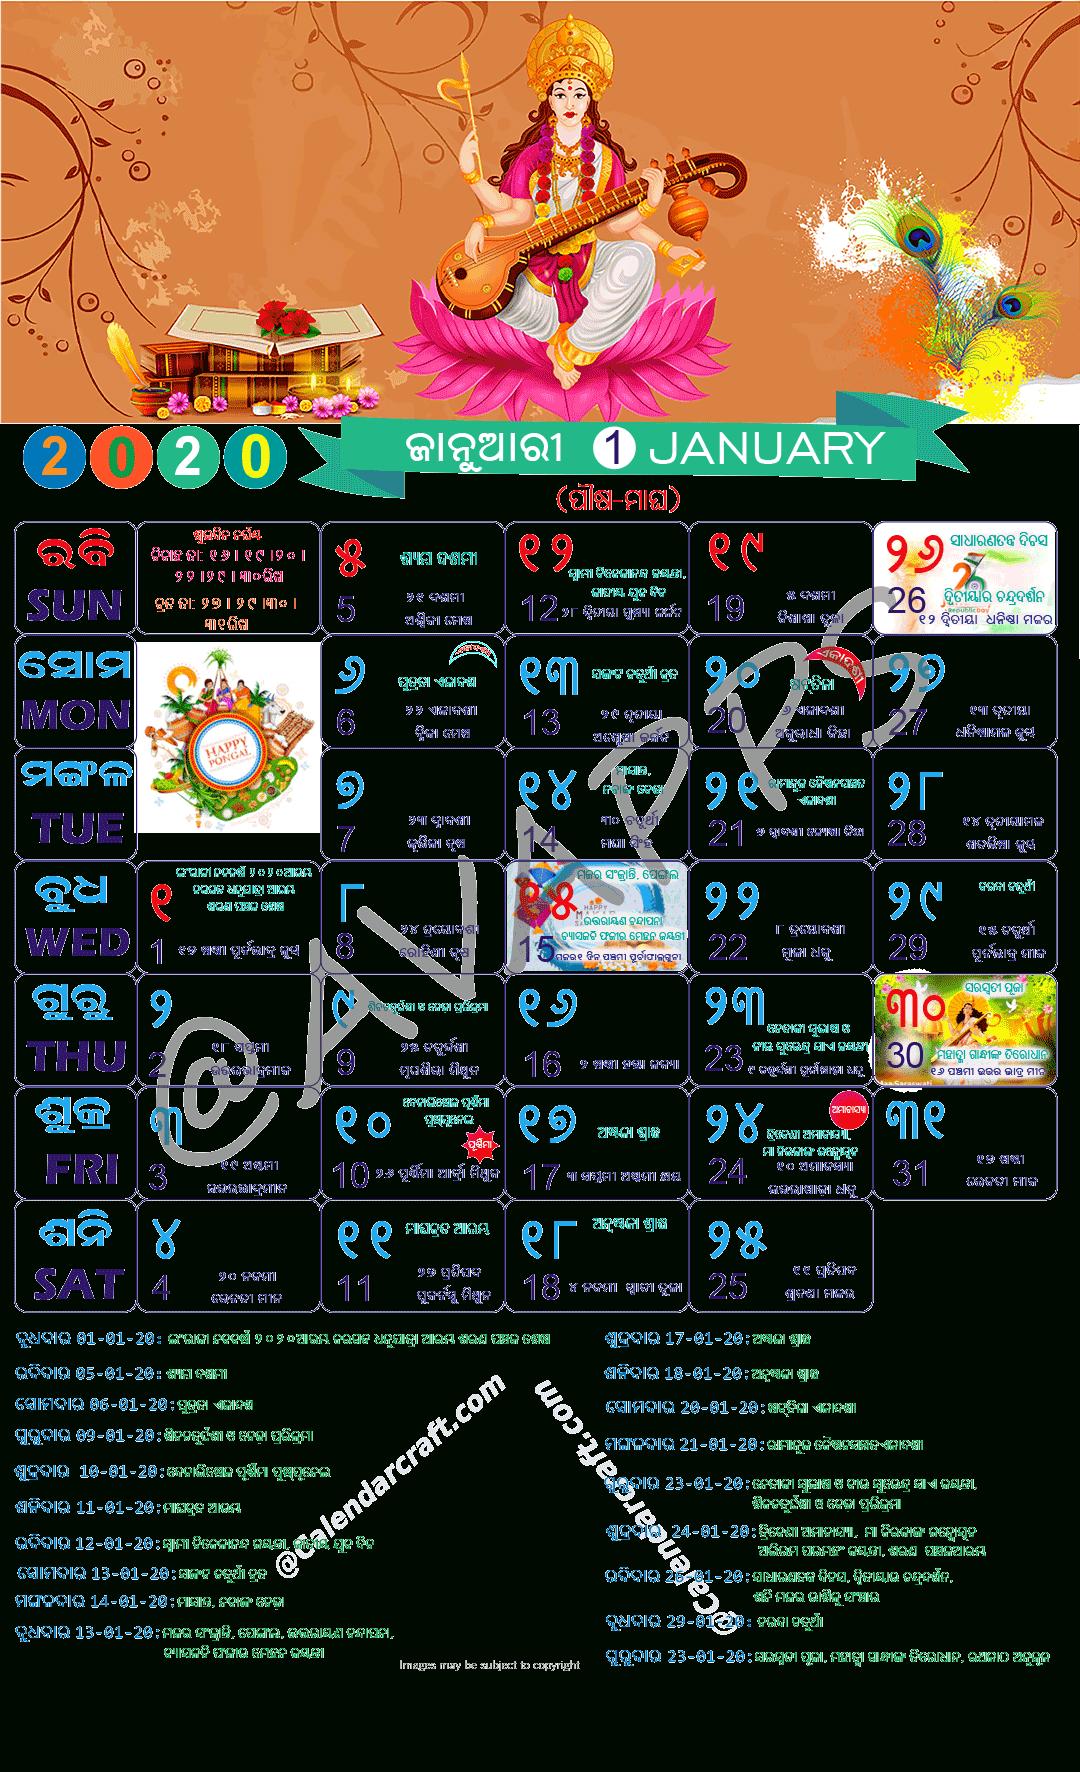 Odisha Govt School Holiday List 2019 Pdf  School Style regarding Download Bihar Sarkar Calendar 2020